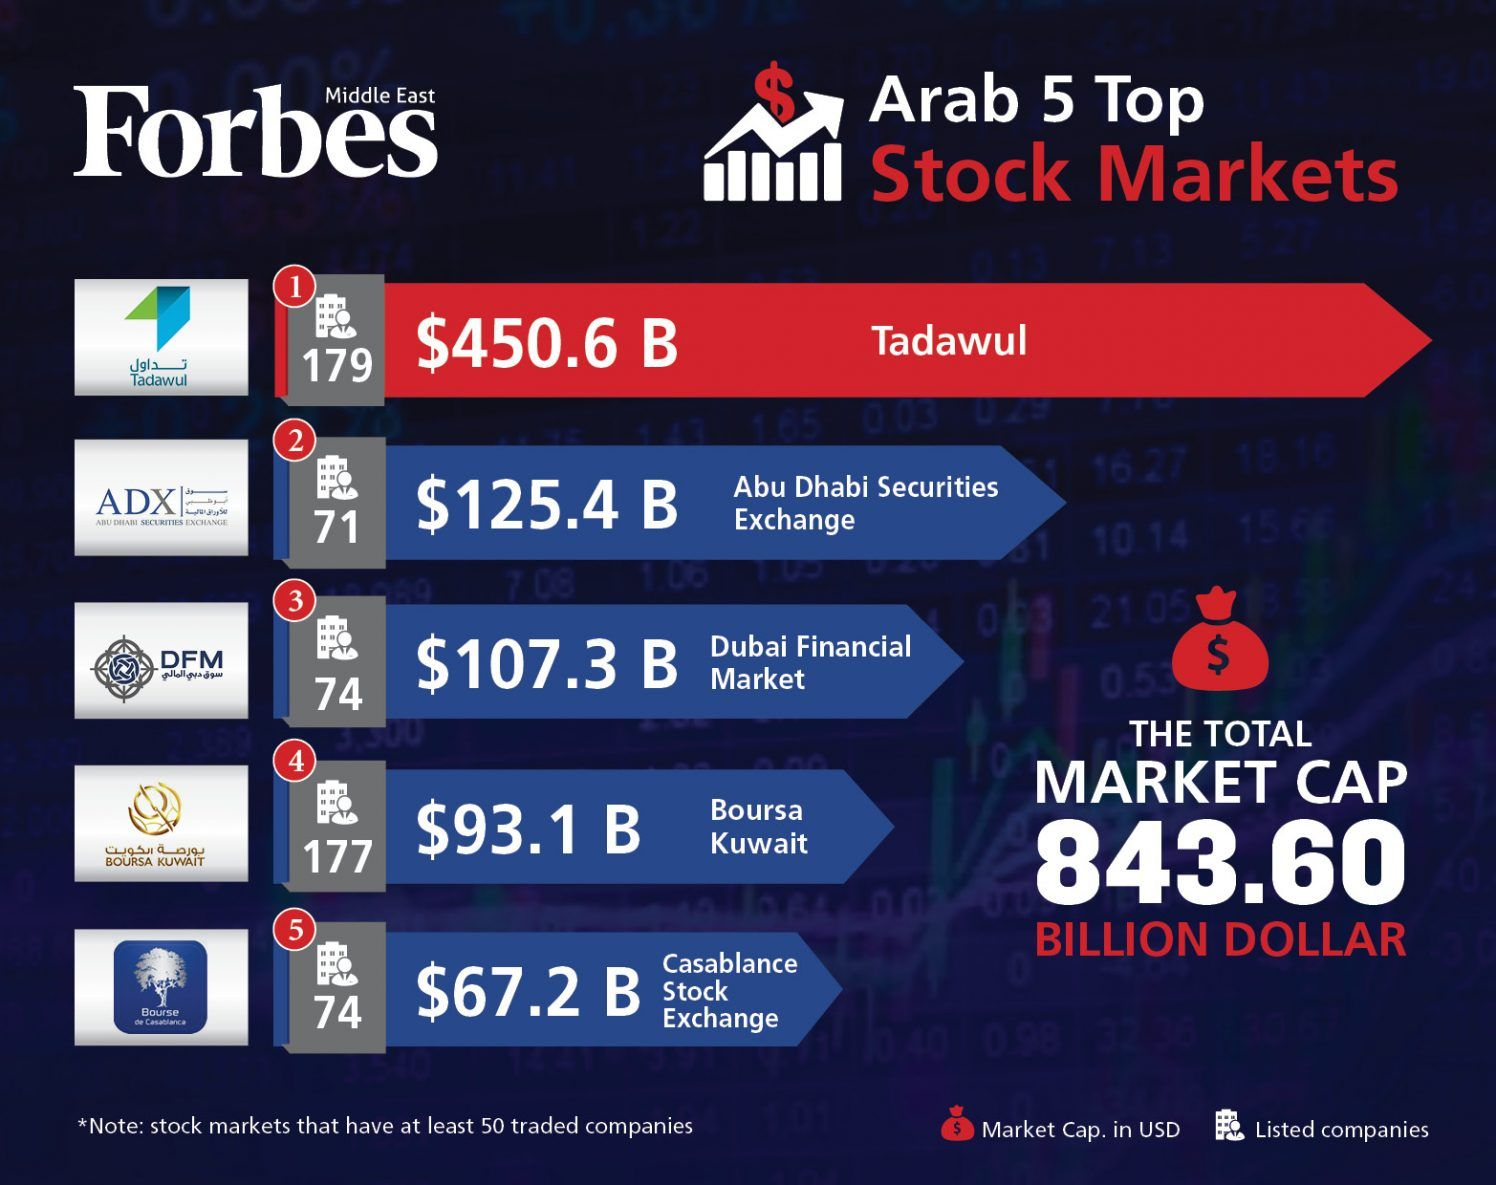 Top 5 Arab Stock Markets Stock Market Dubai Market Marketing